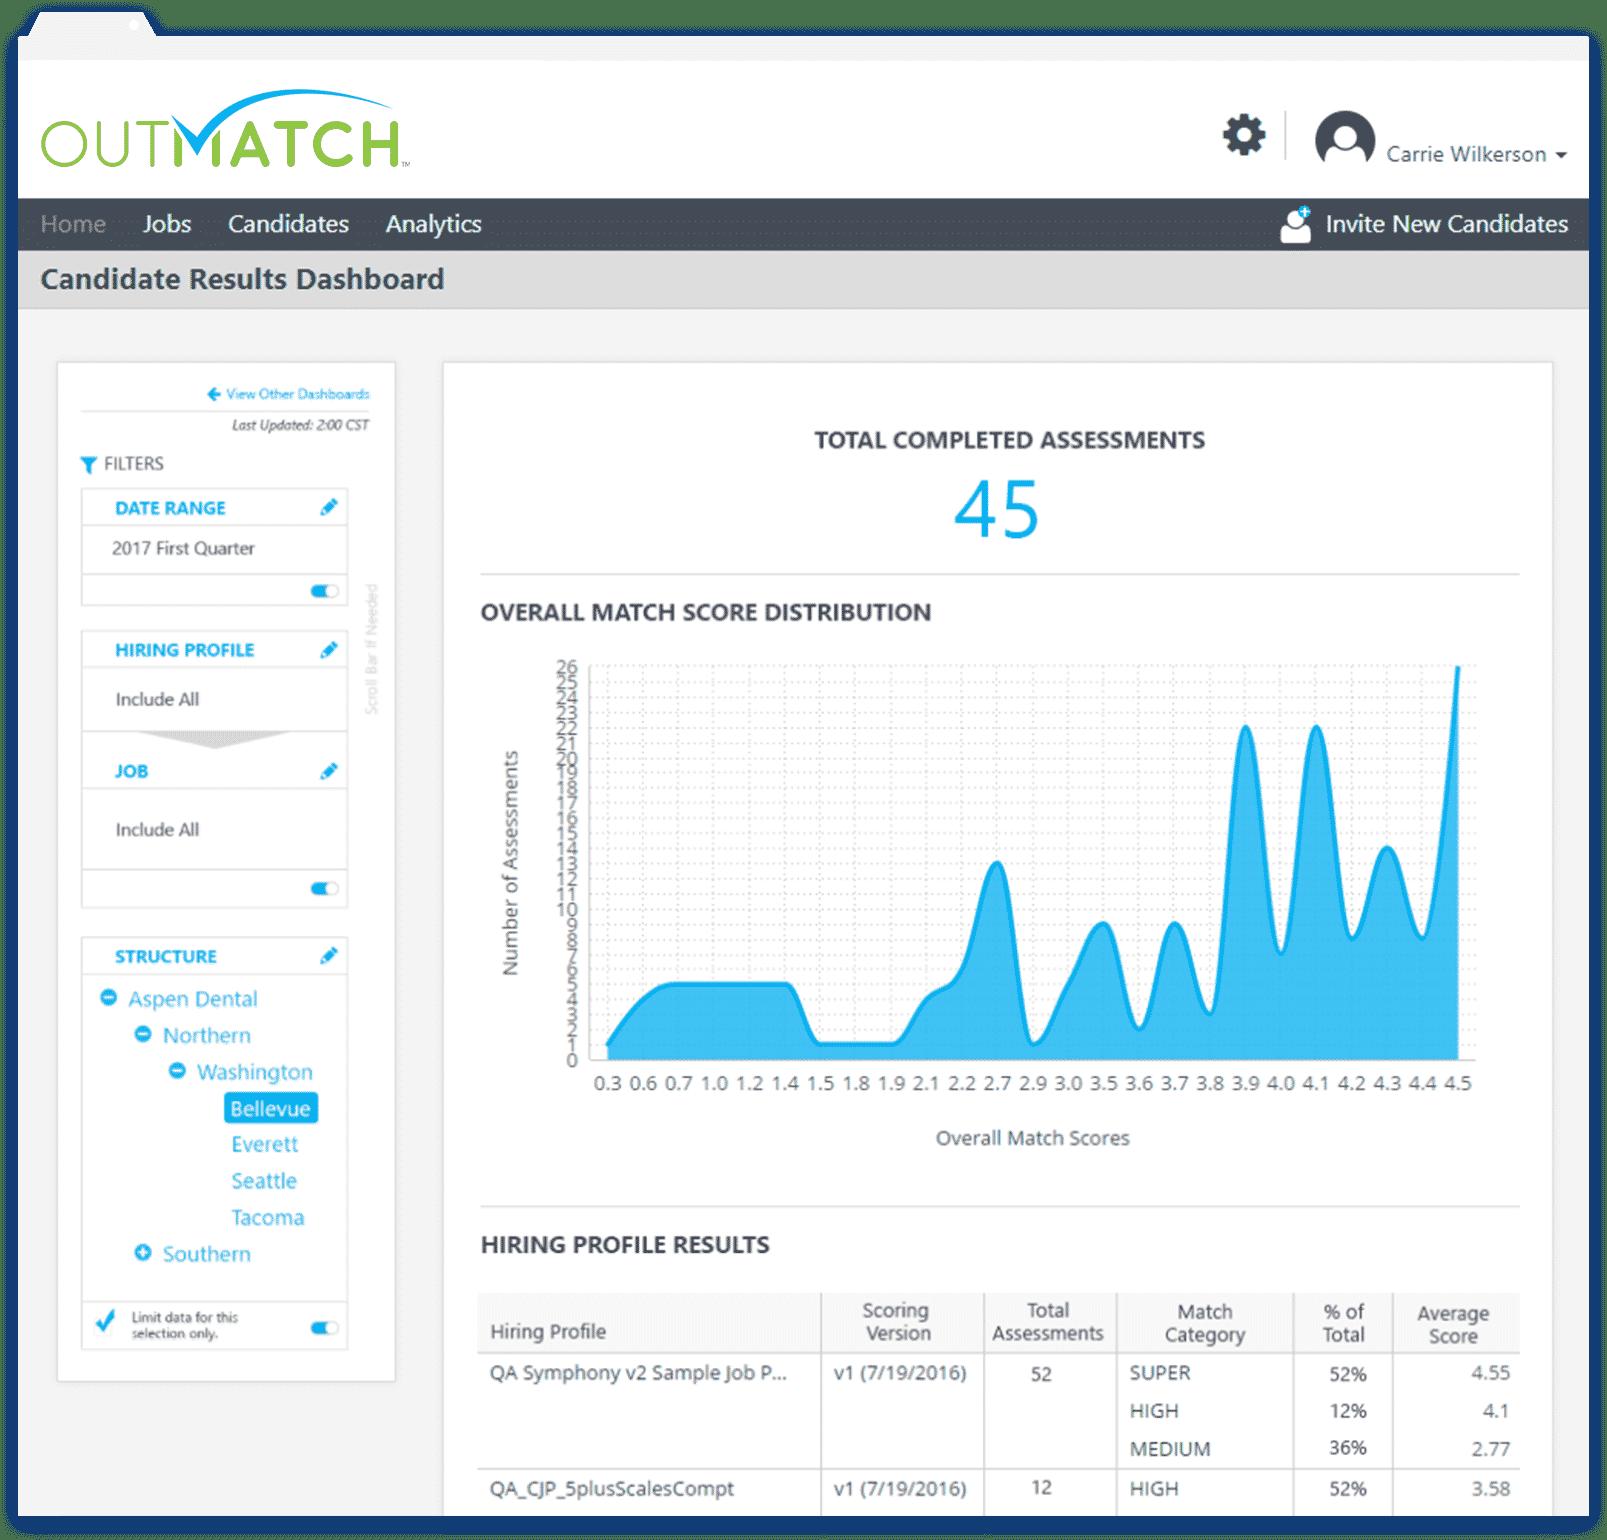 Analytics – Mobile Usage